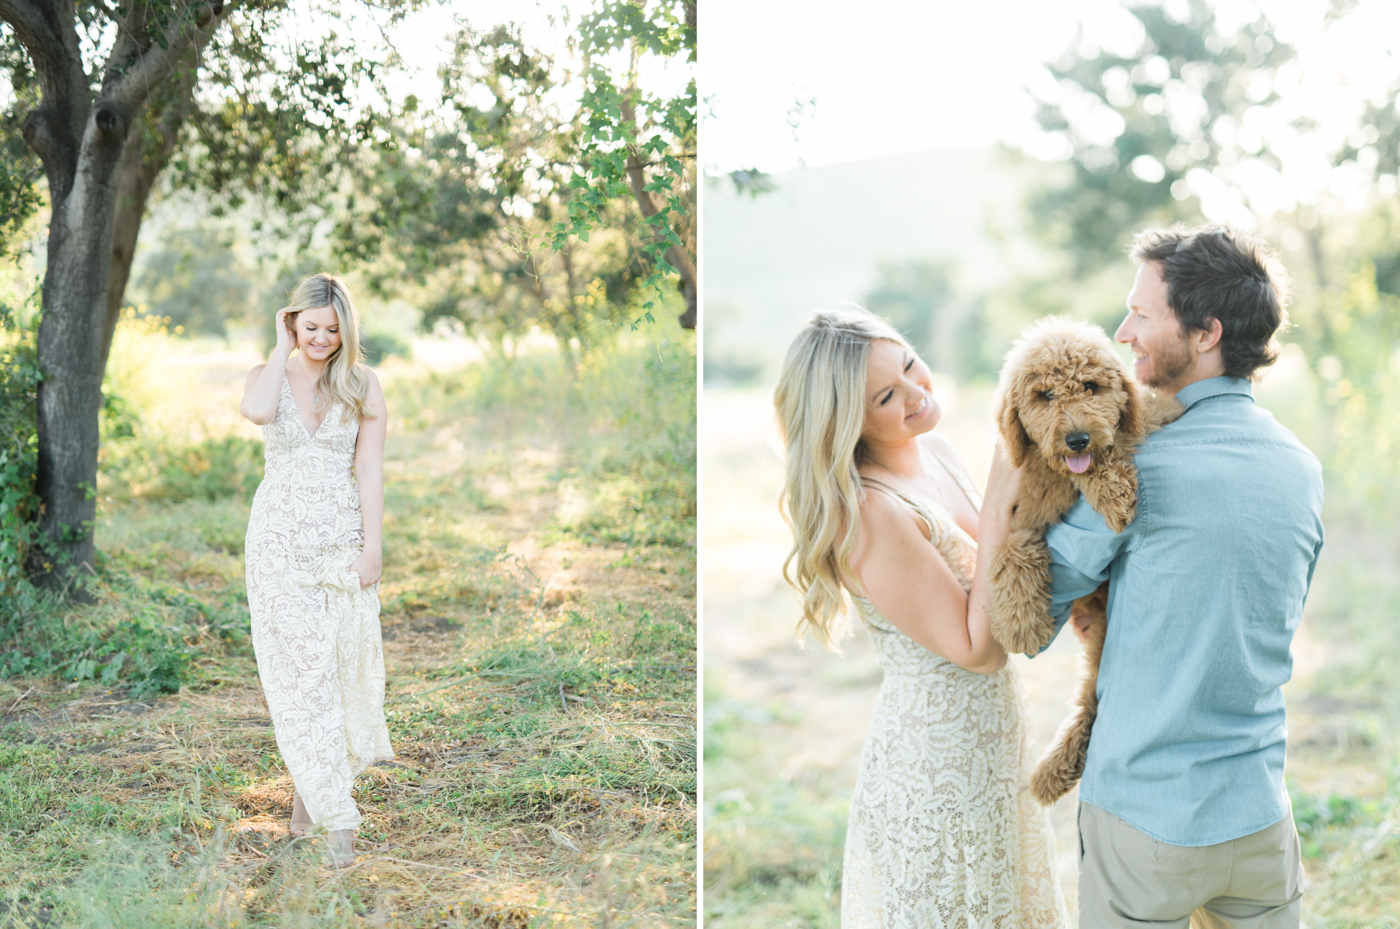 San_Juan_Capistrano_Goldendoodle_family_portrait_session_los_angeles_wedding_photographer-111.jpg